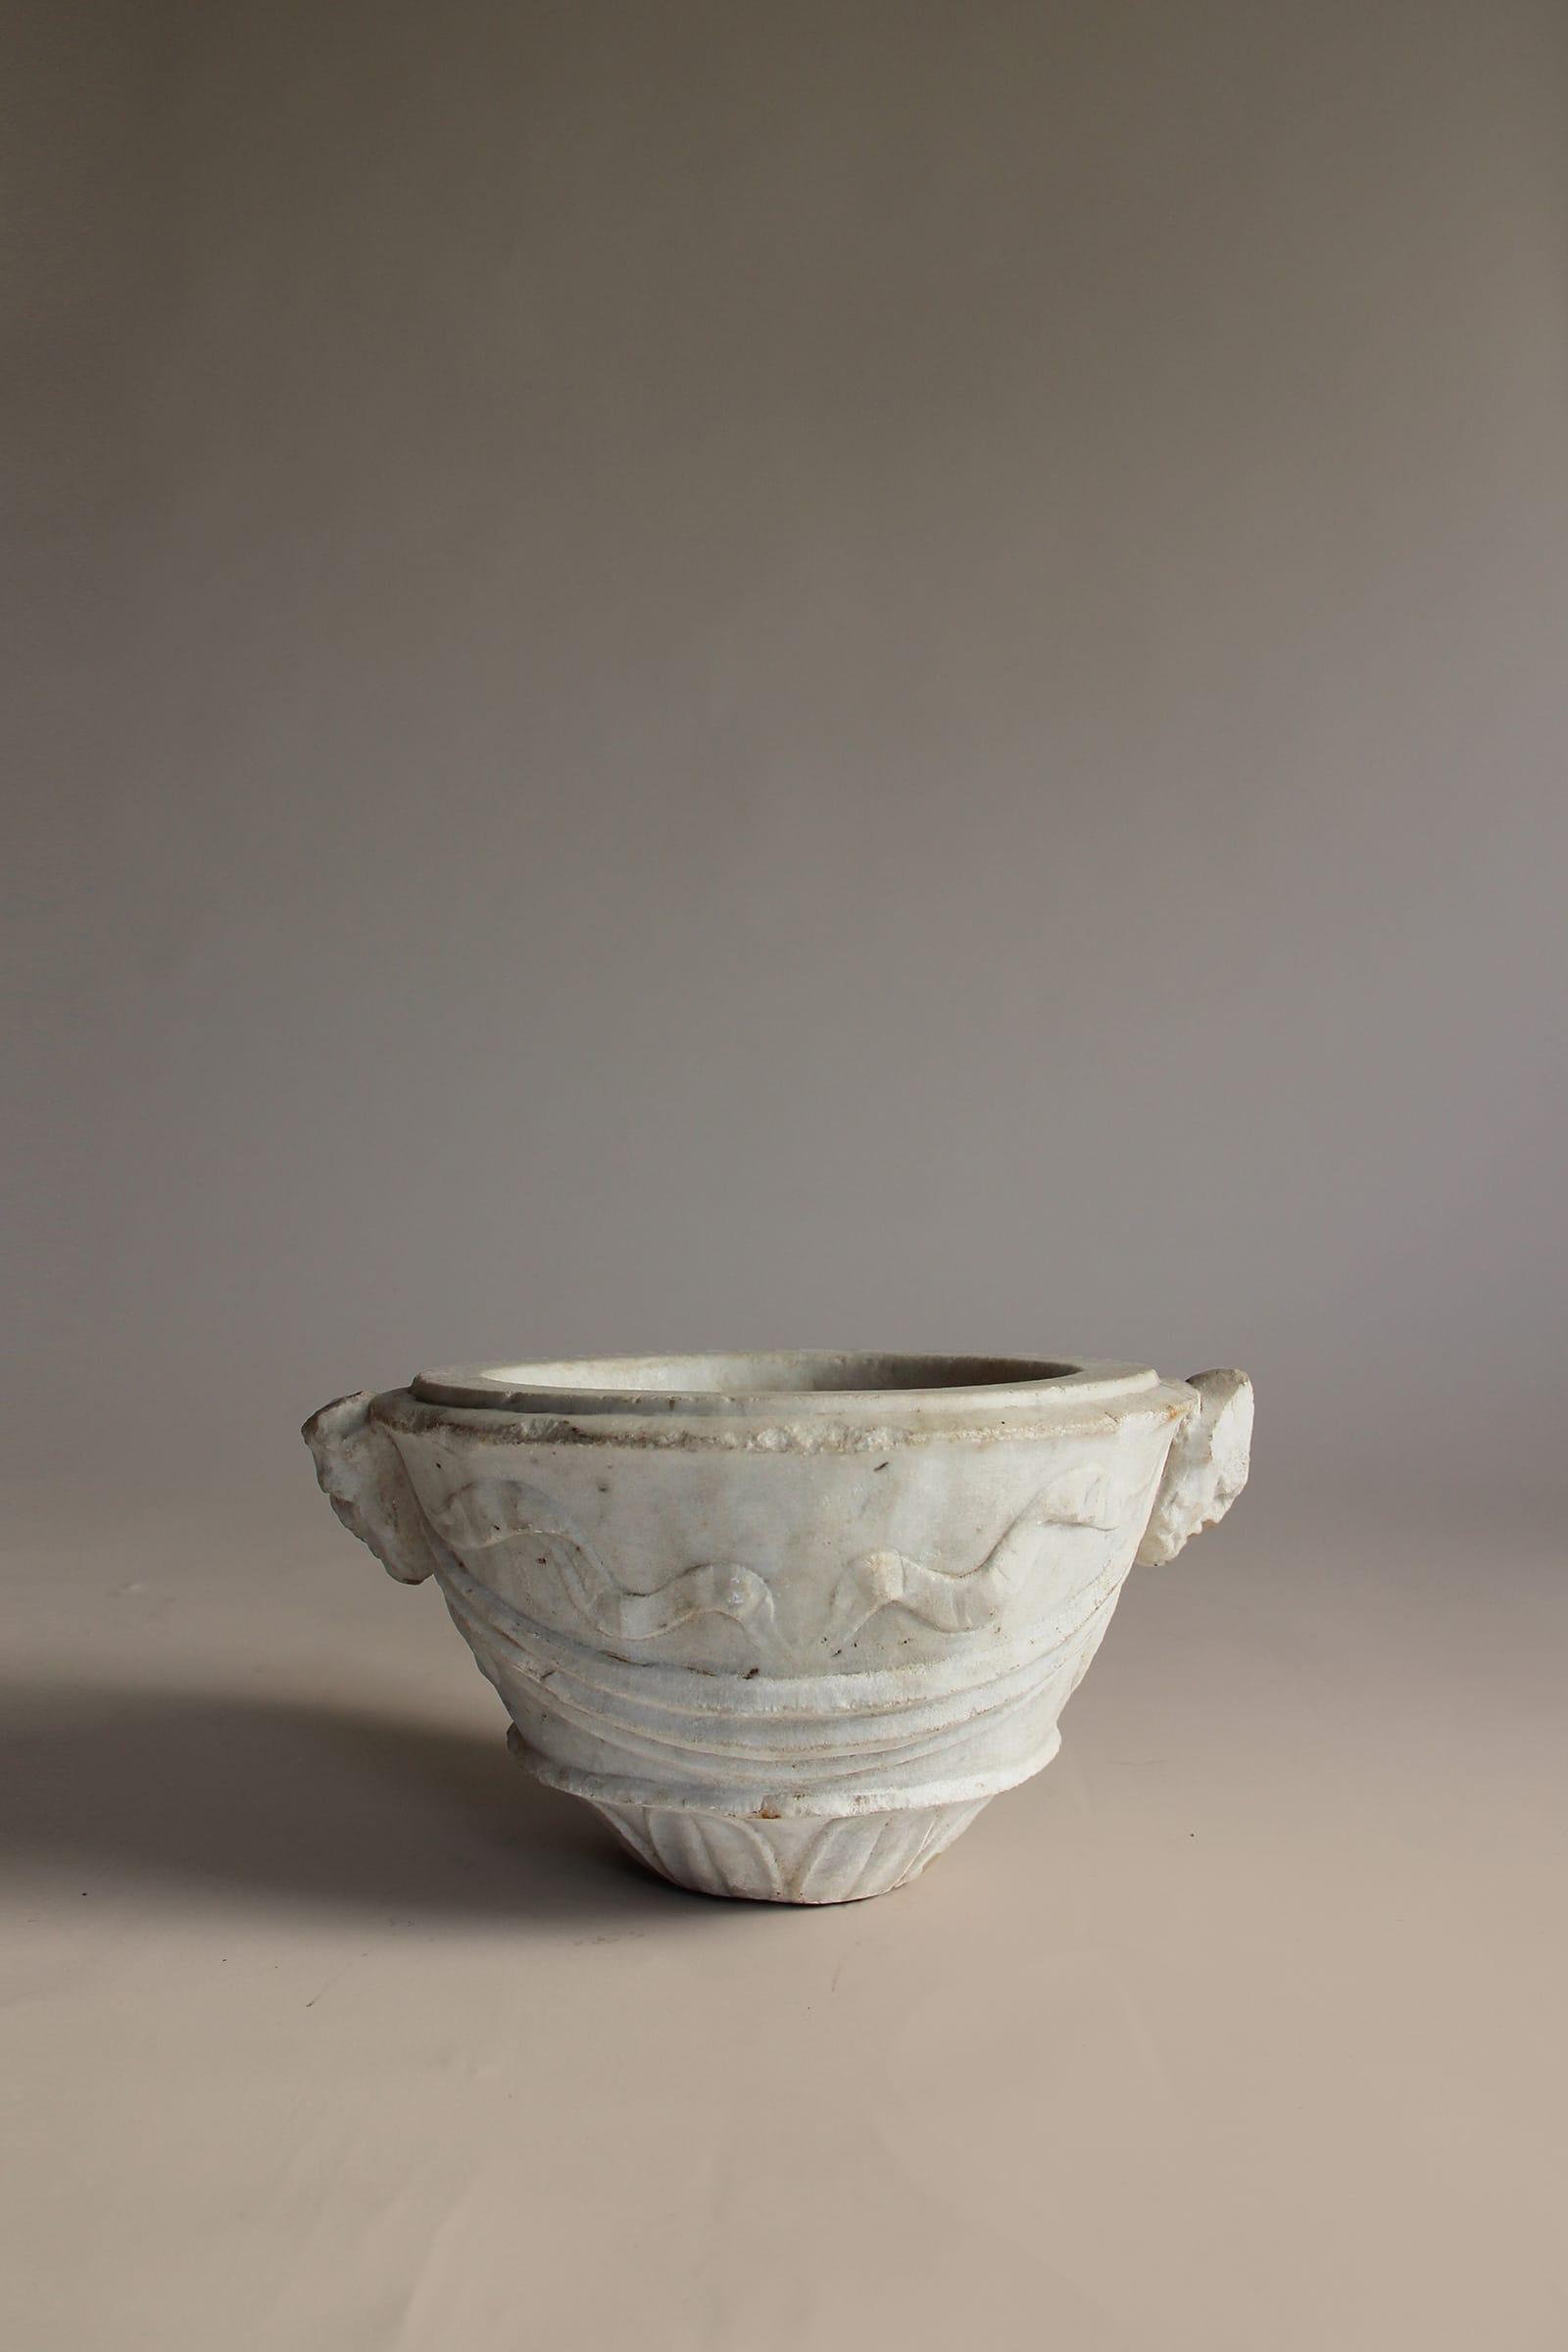 16th CENTURY BOWL